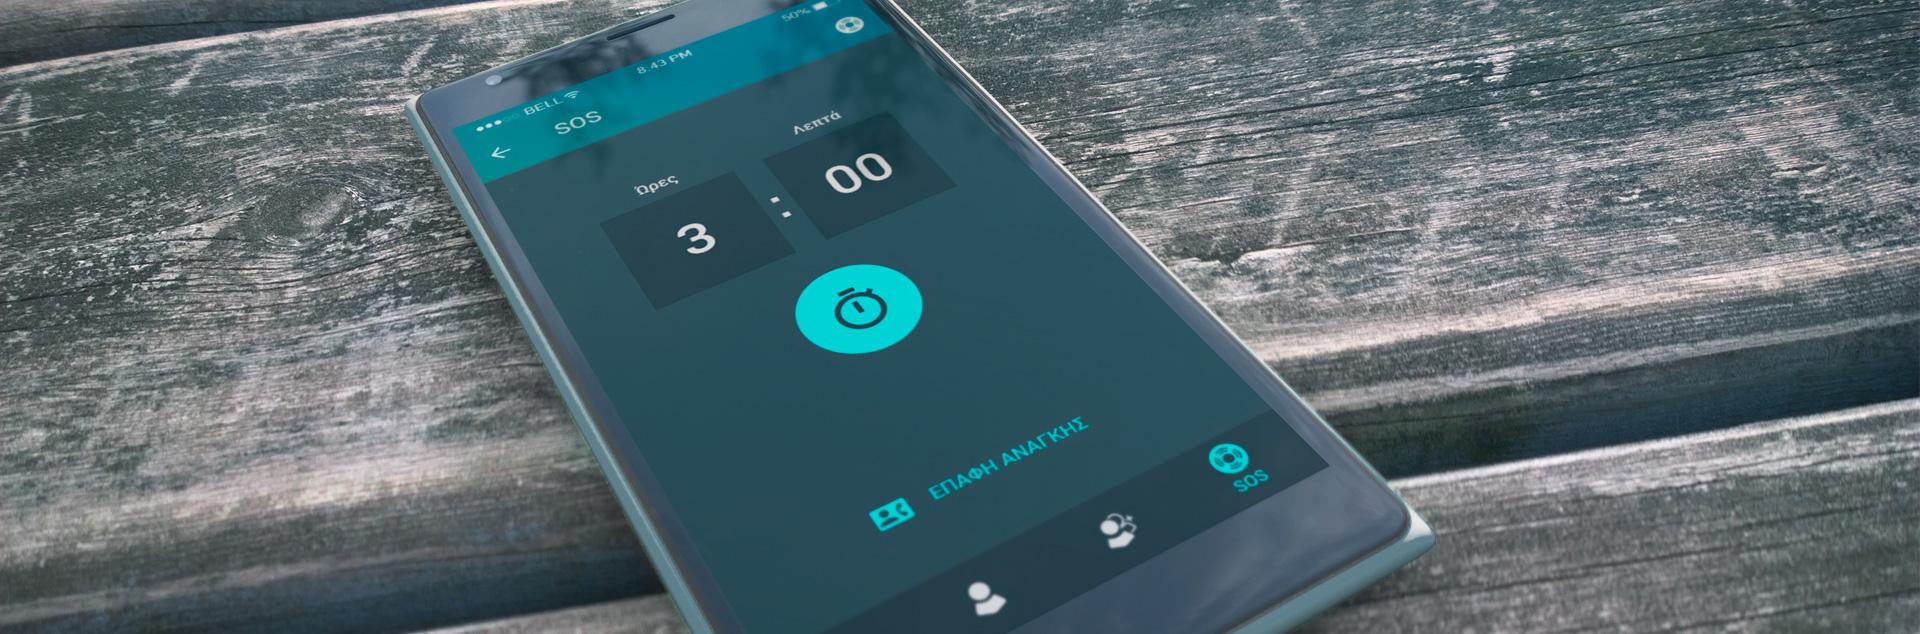 BlueSpear mobile app - alarm